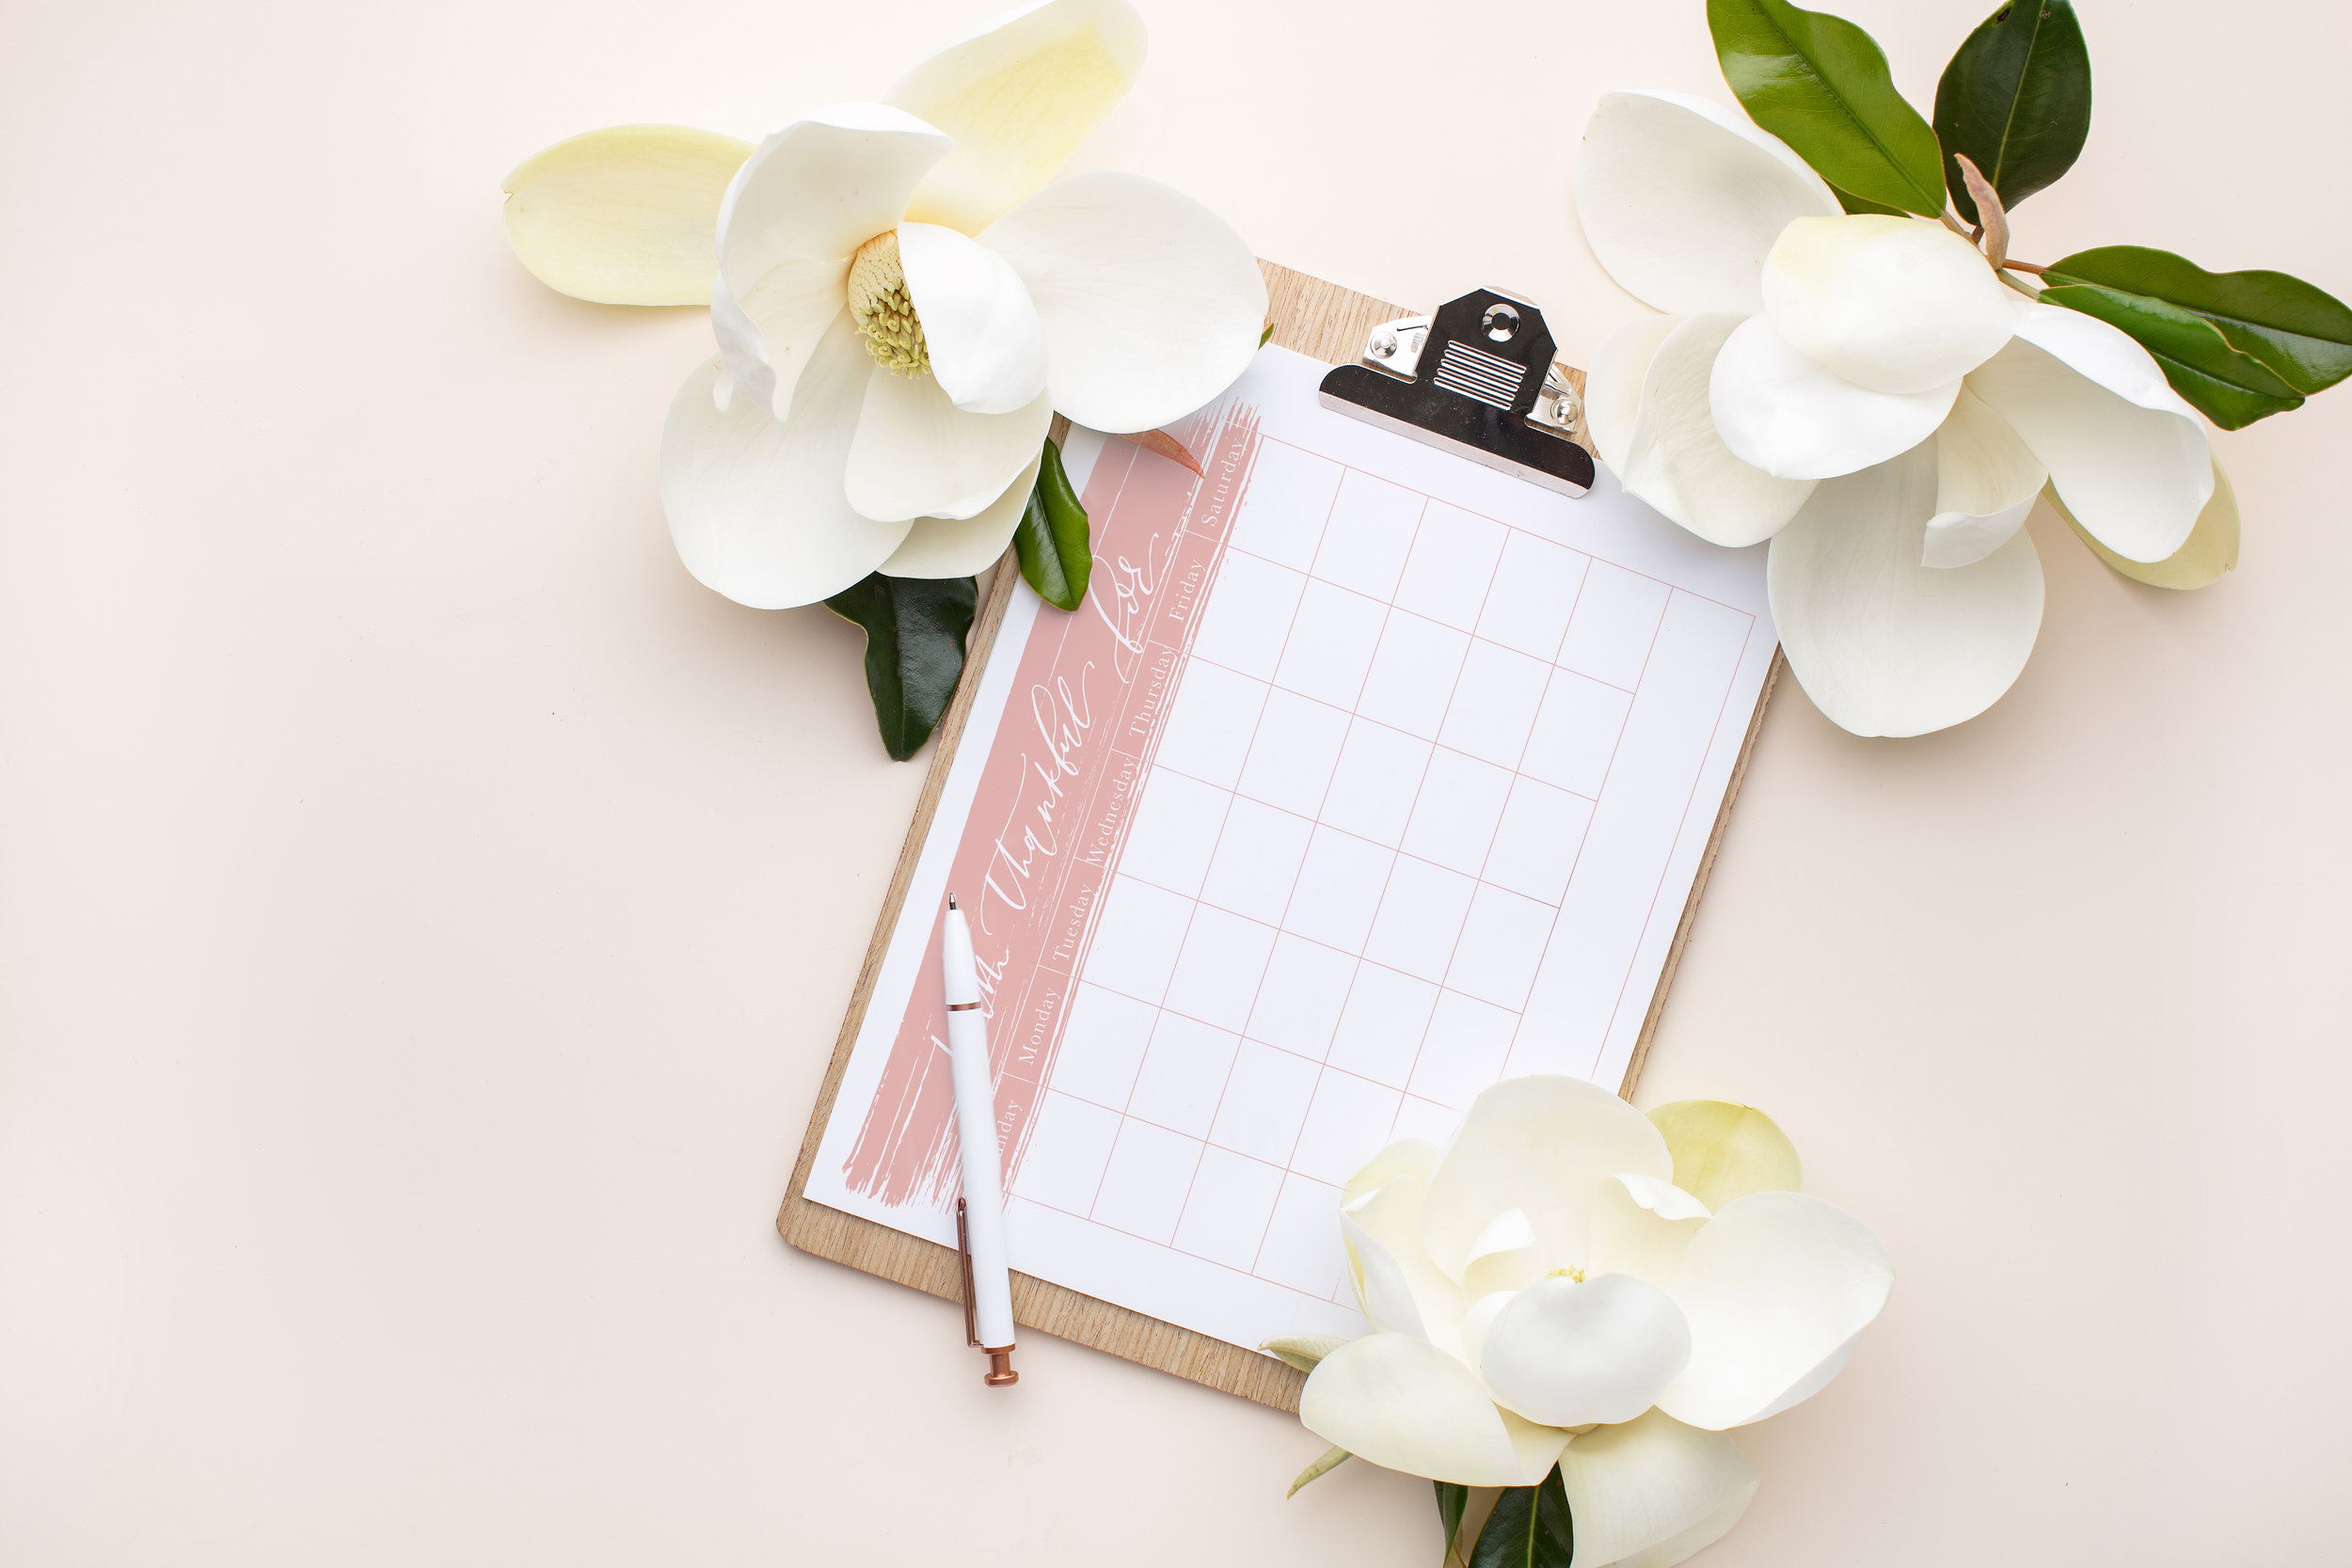 Free Printable Thankfulness Tracker/ Calendar | Lauren Antoniaa Calligraphy and Design